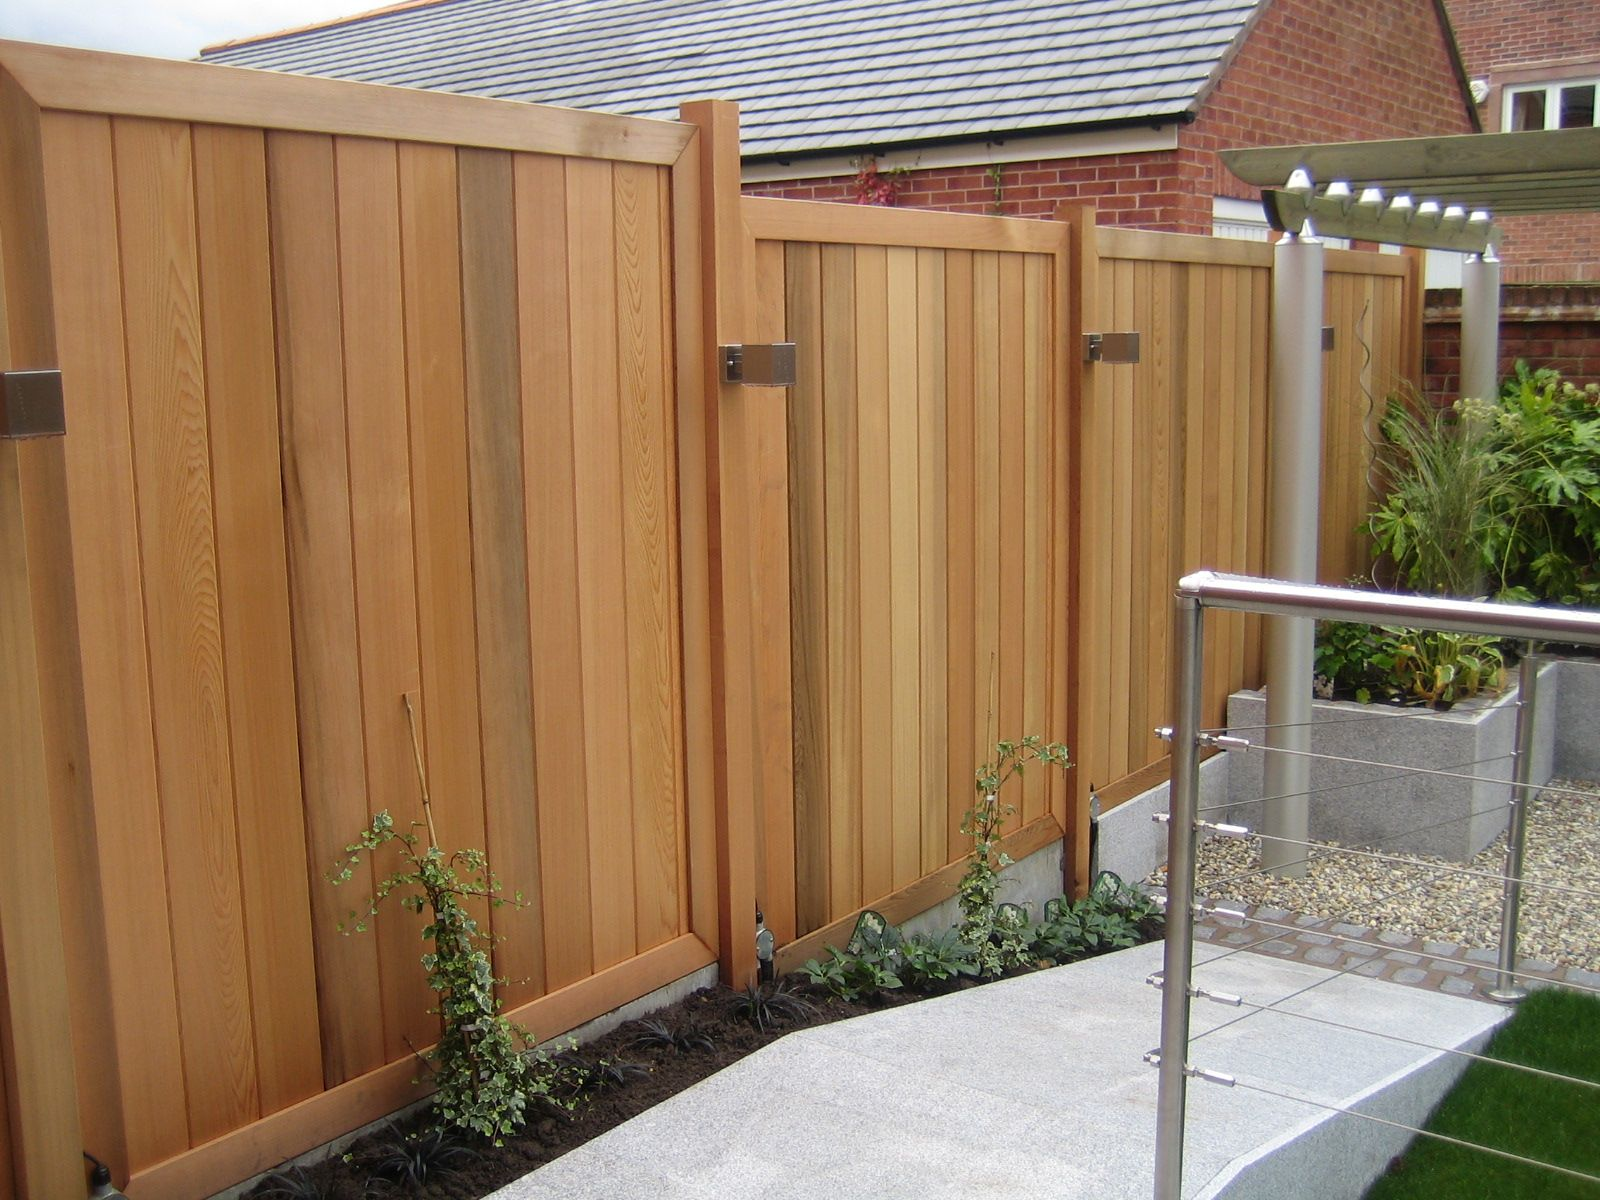 Pin By David Choy On Cedar Fence Cedar Wood Fence Fence Design Contemporary Fence Panels